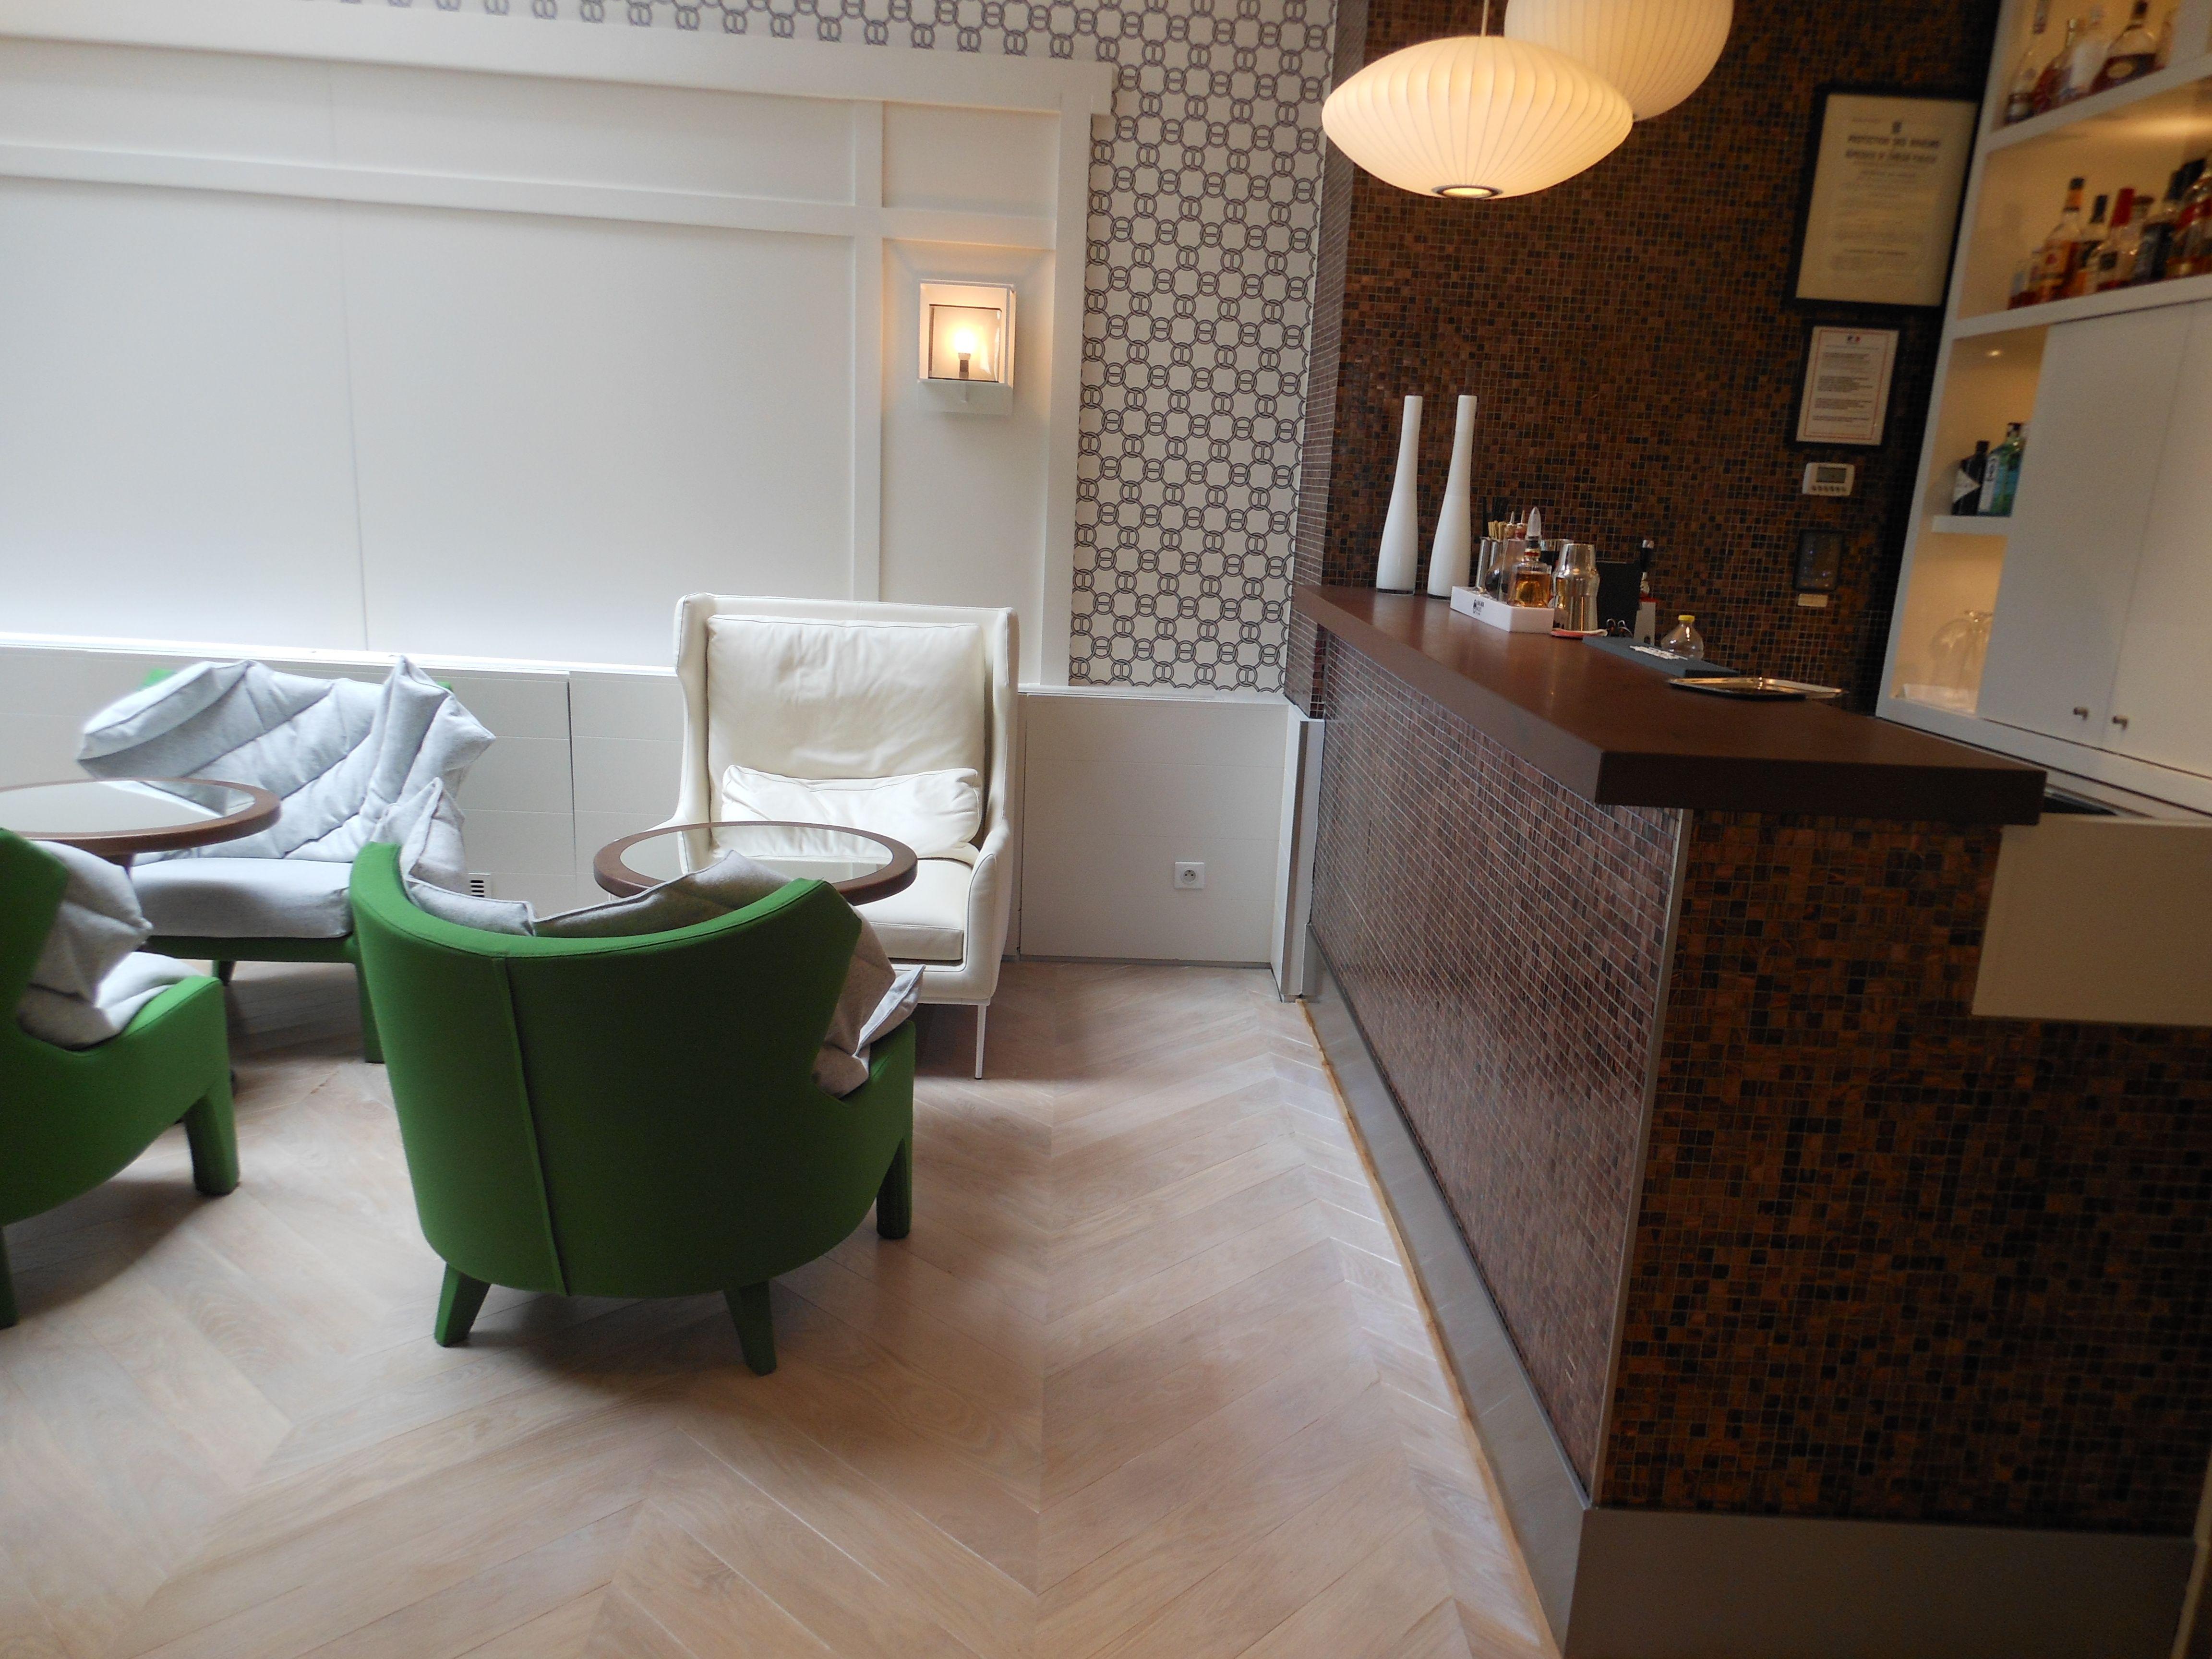 #Hotel #design #art #project #Contempo #Paris